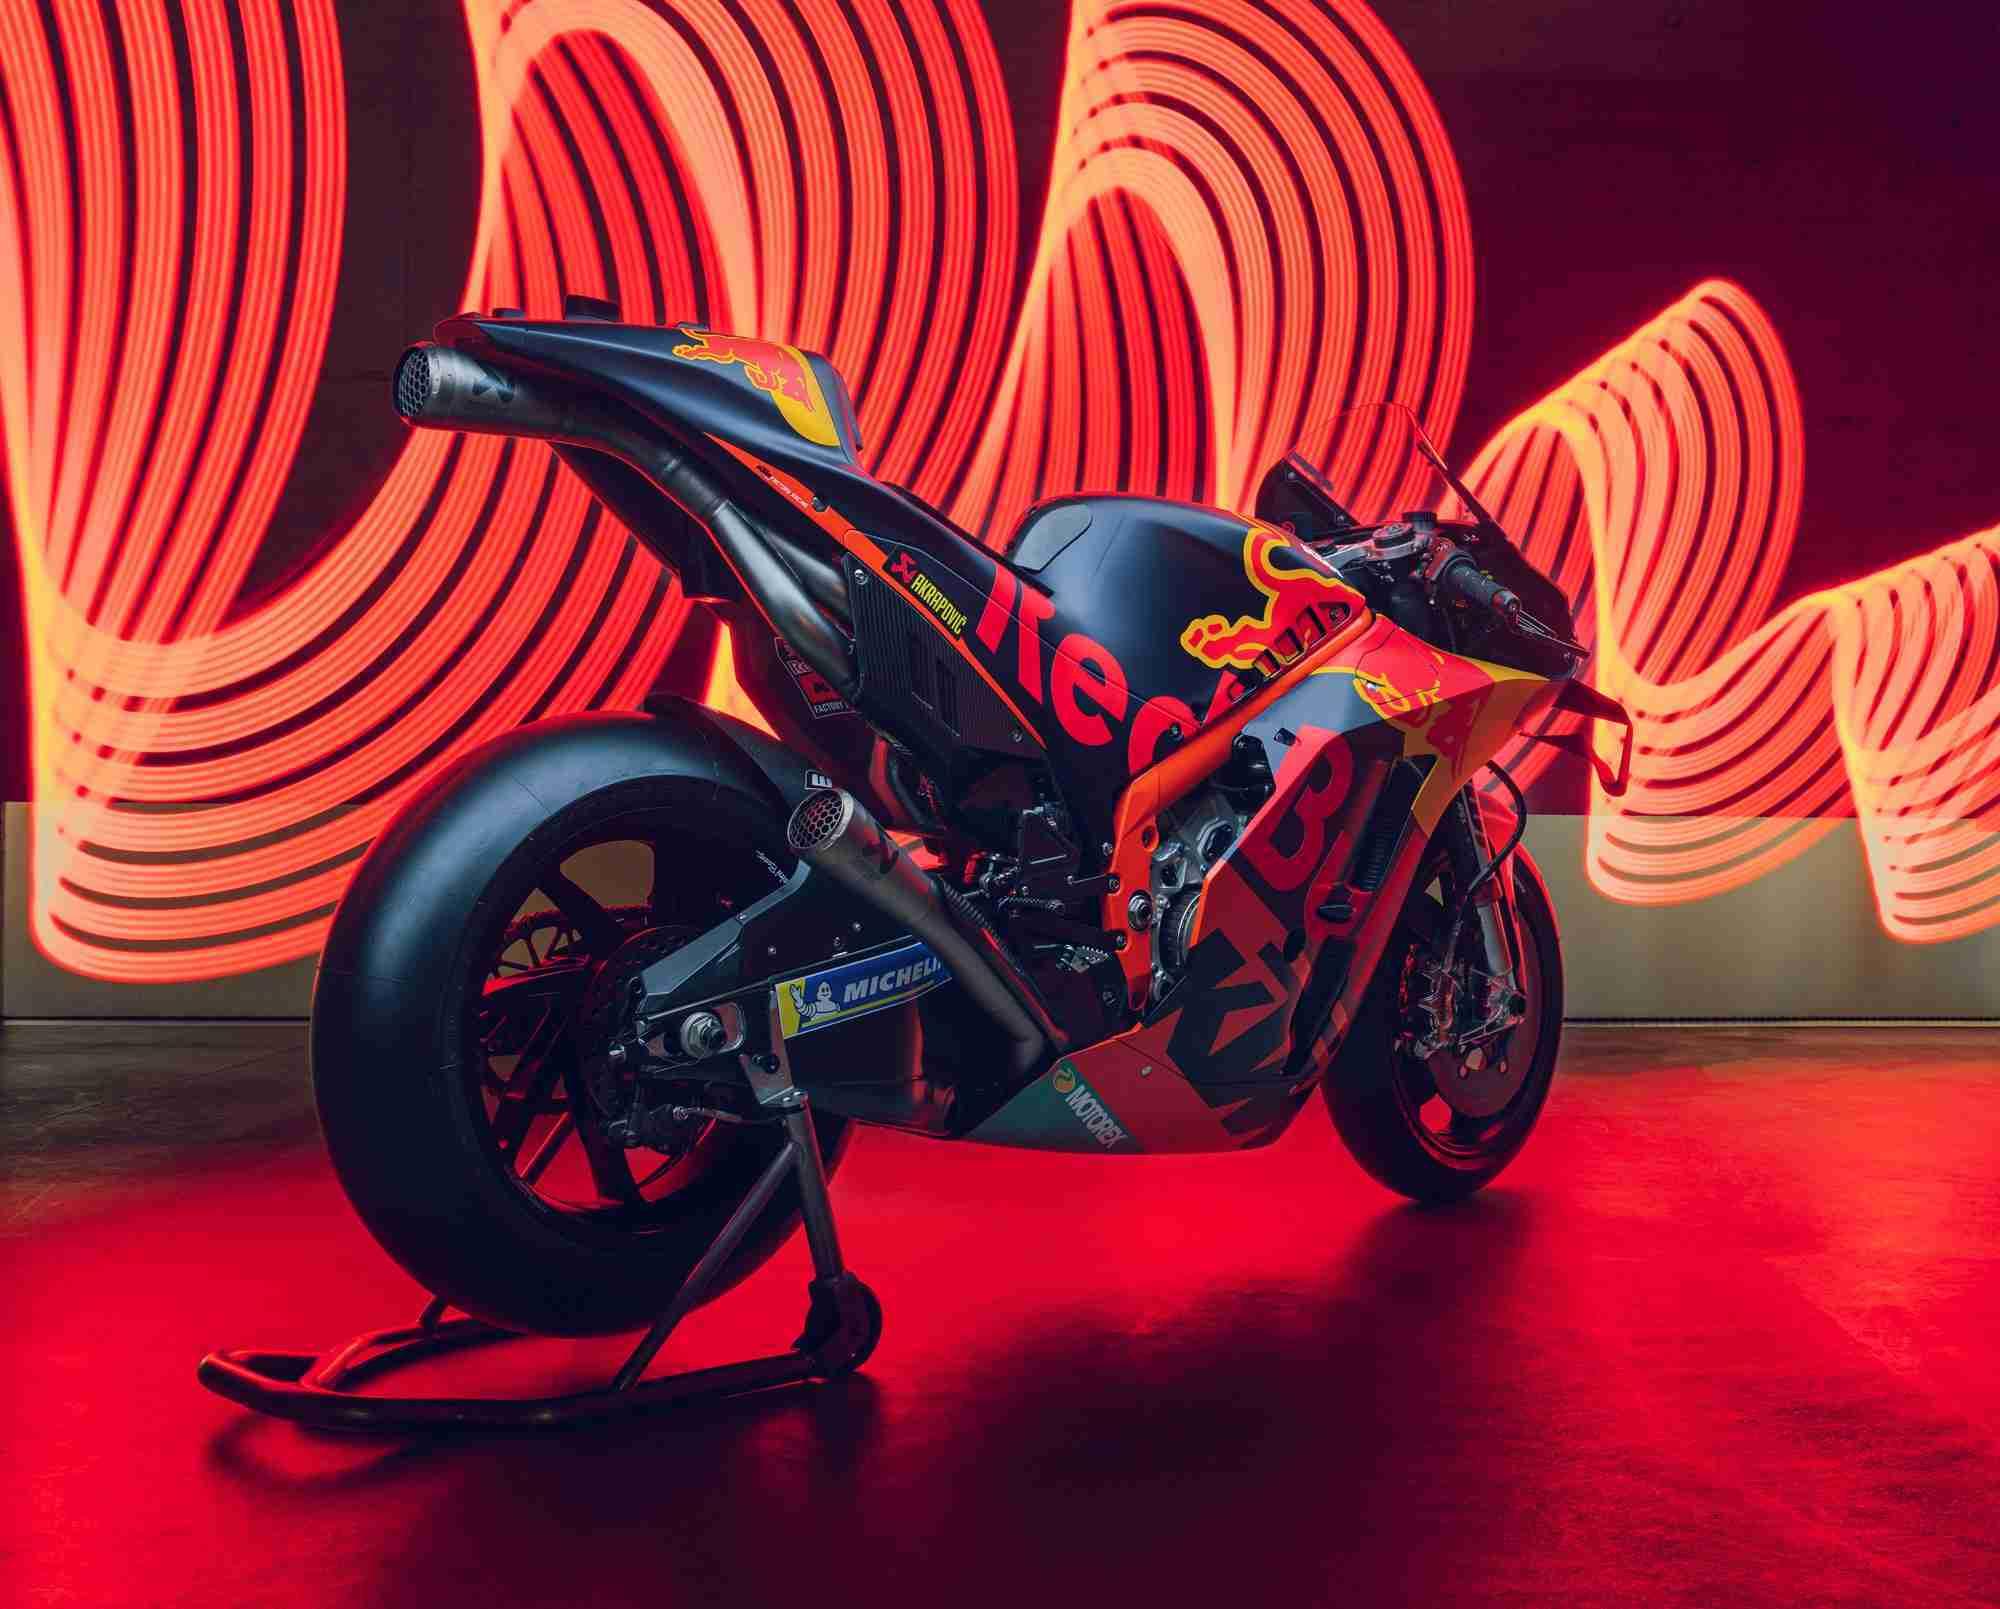 2020 KTM RC16 MotoGP bike specifications